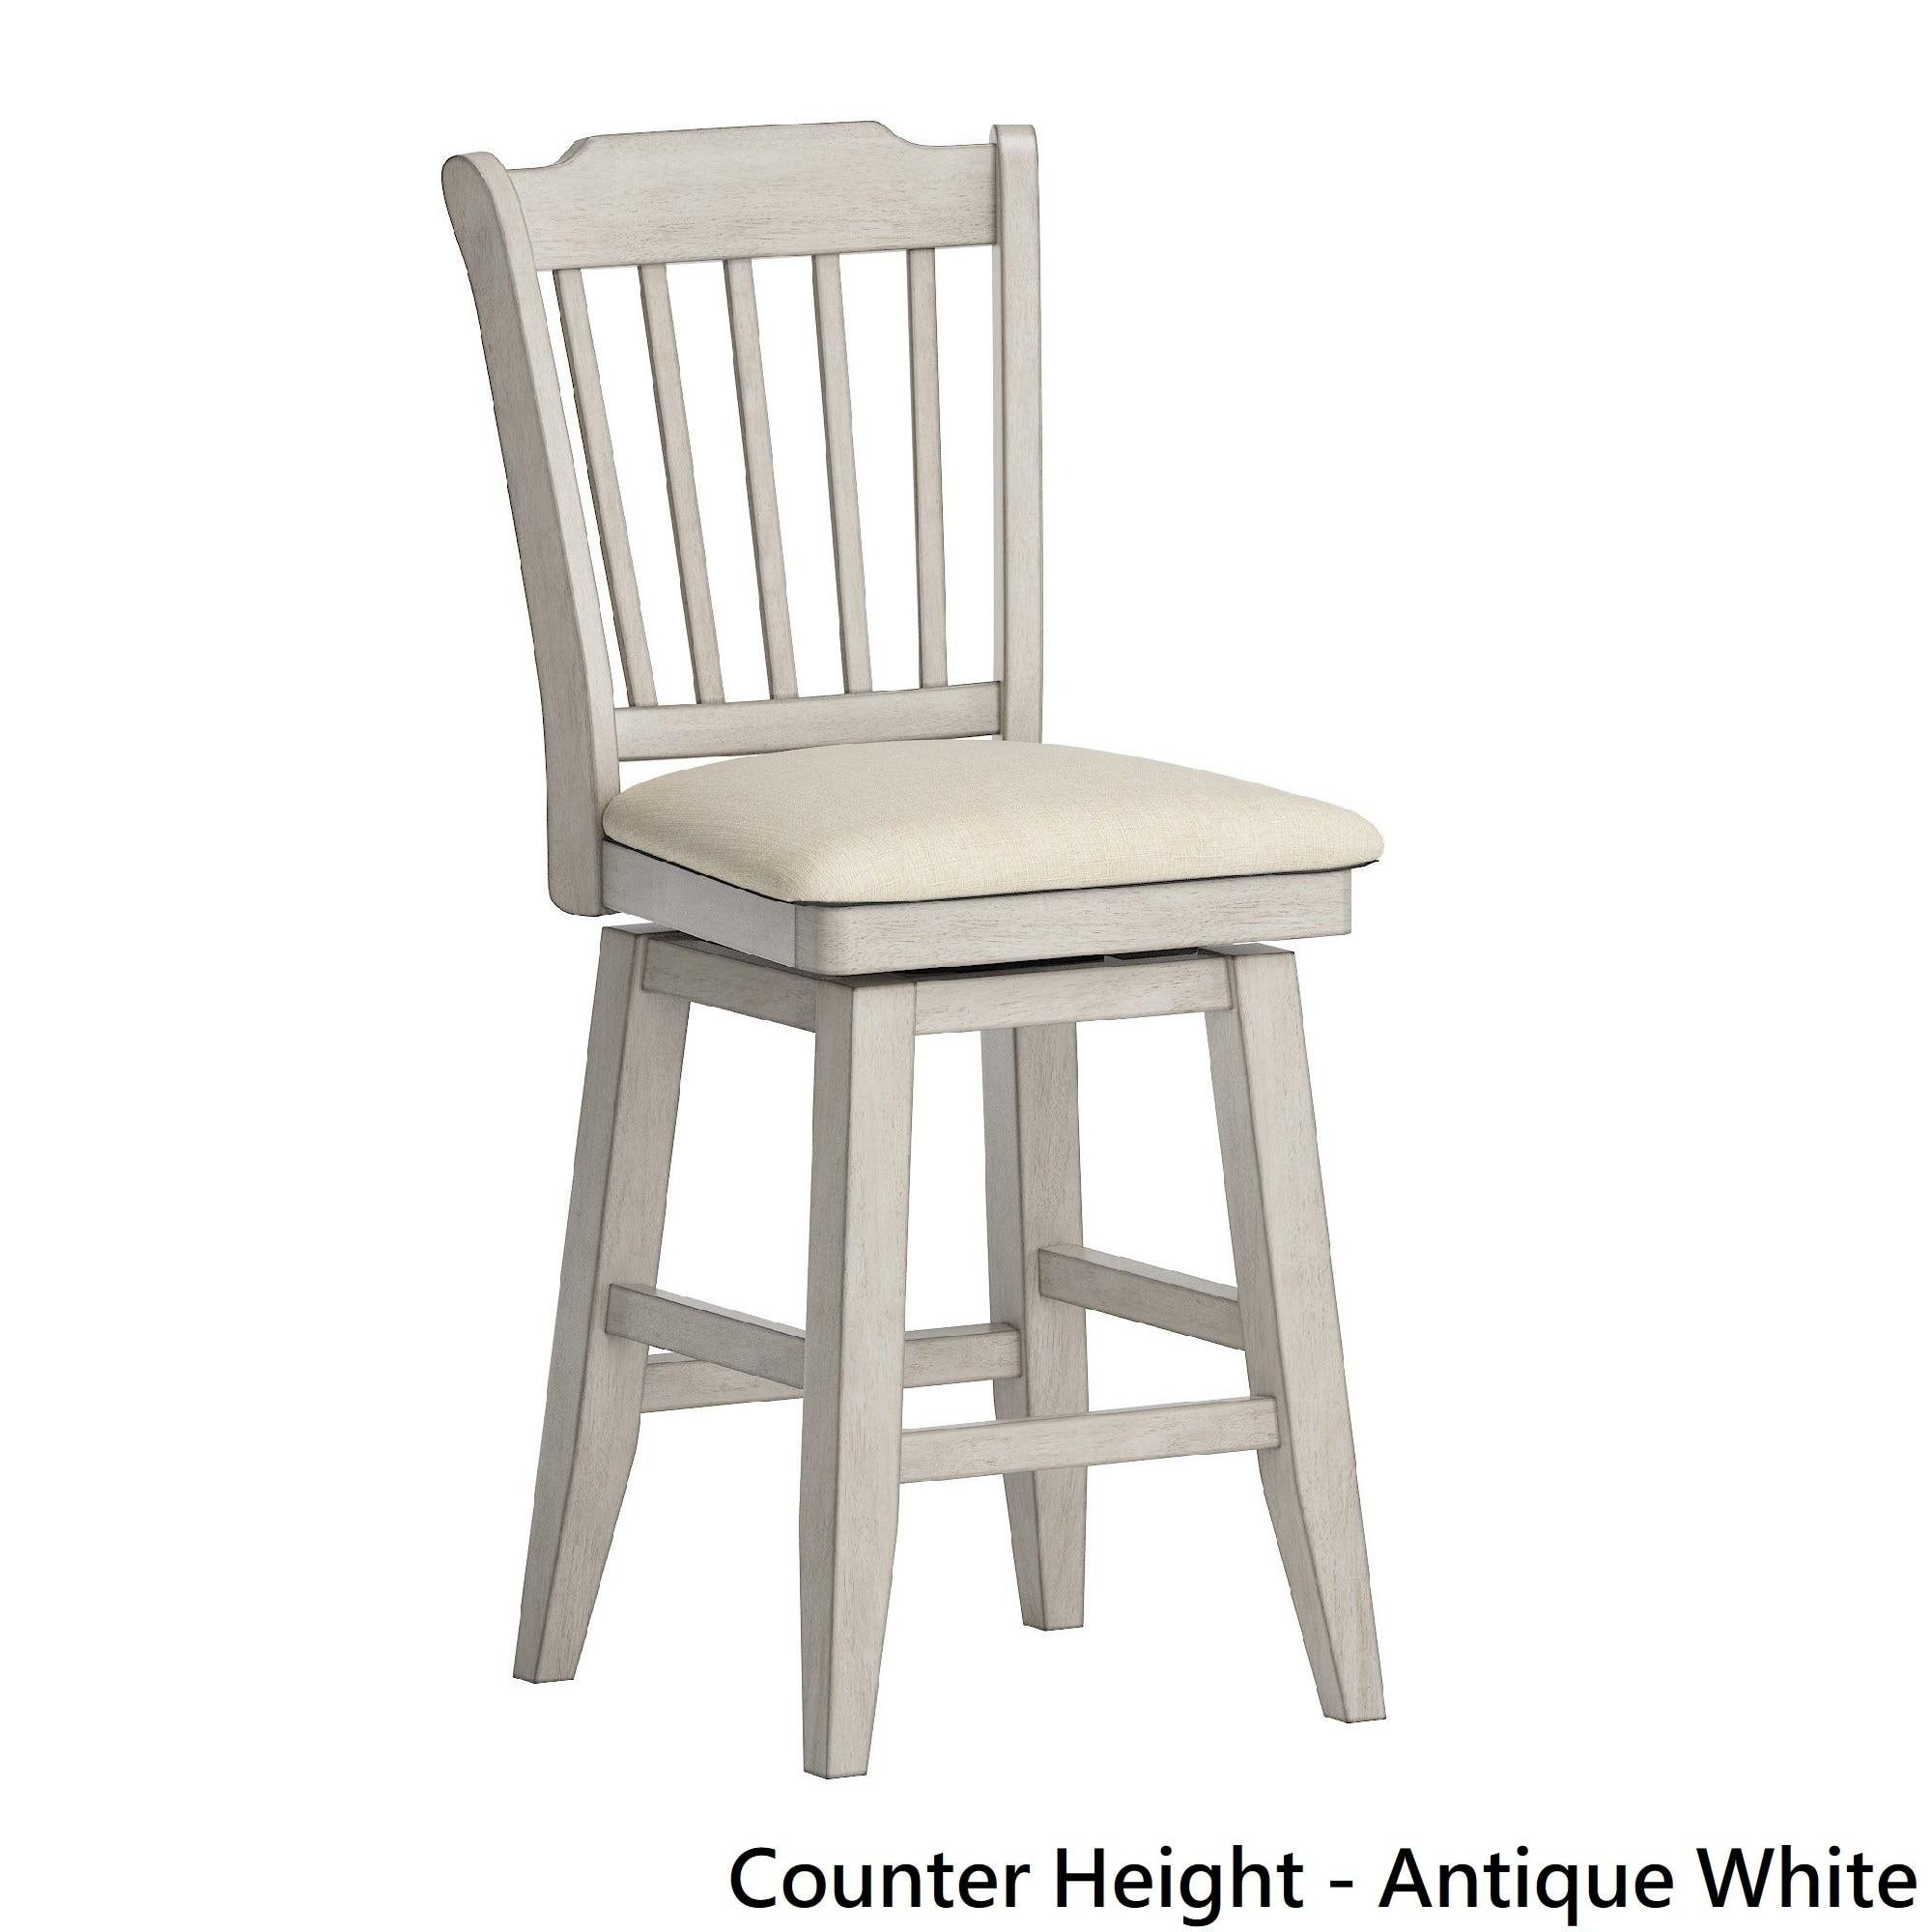 Surprising Eleanor Slat Back Wood Swivel Chair By Inspire Q Classic Onthecornerstone Fun Painted Chair Ideas Images Onthecornerstoneorg